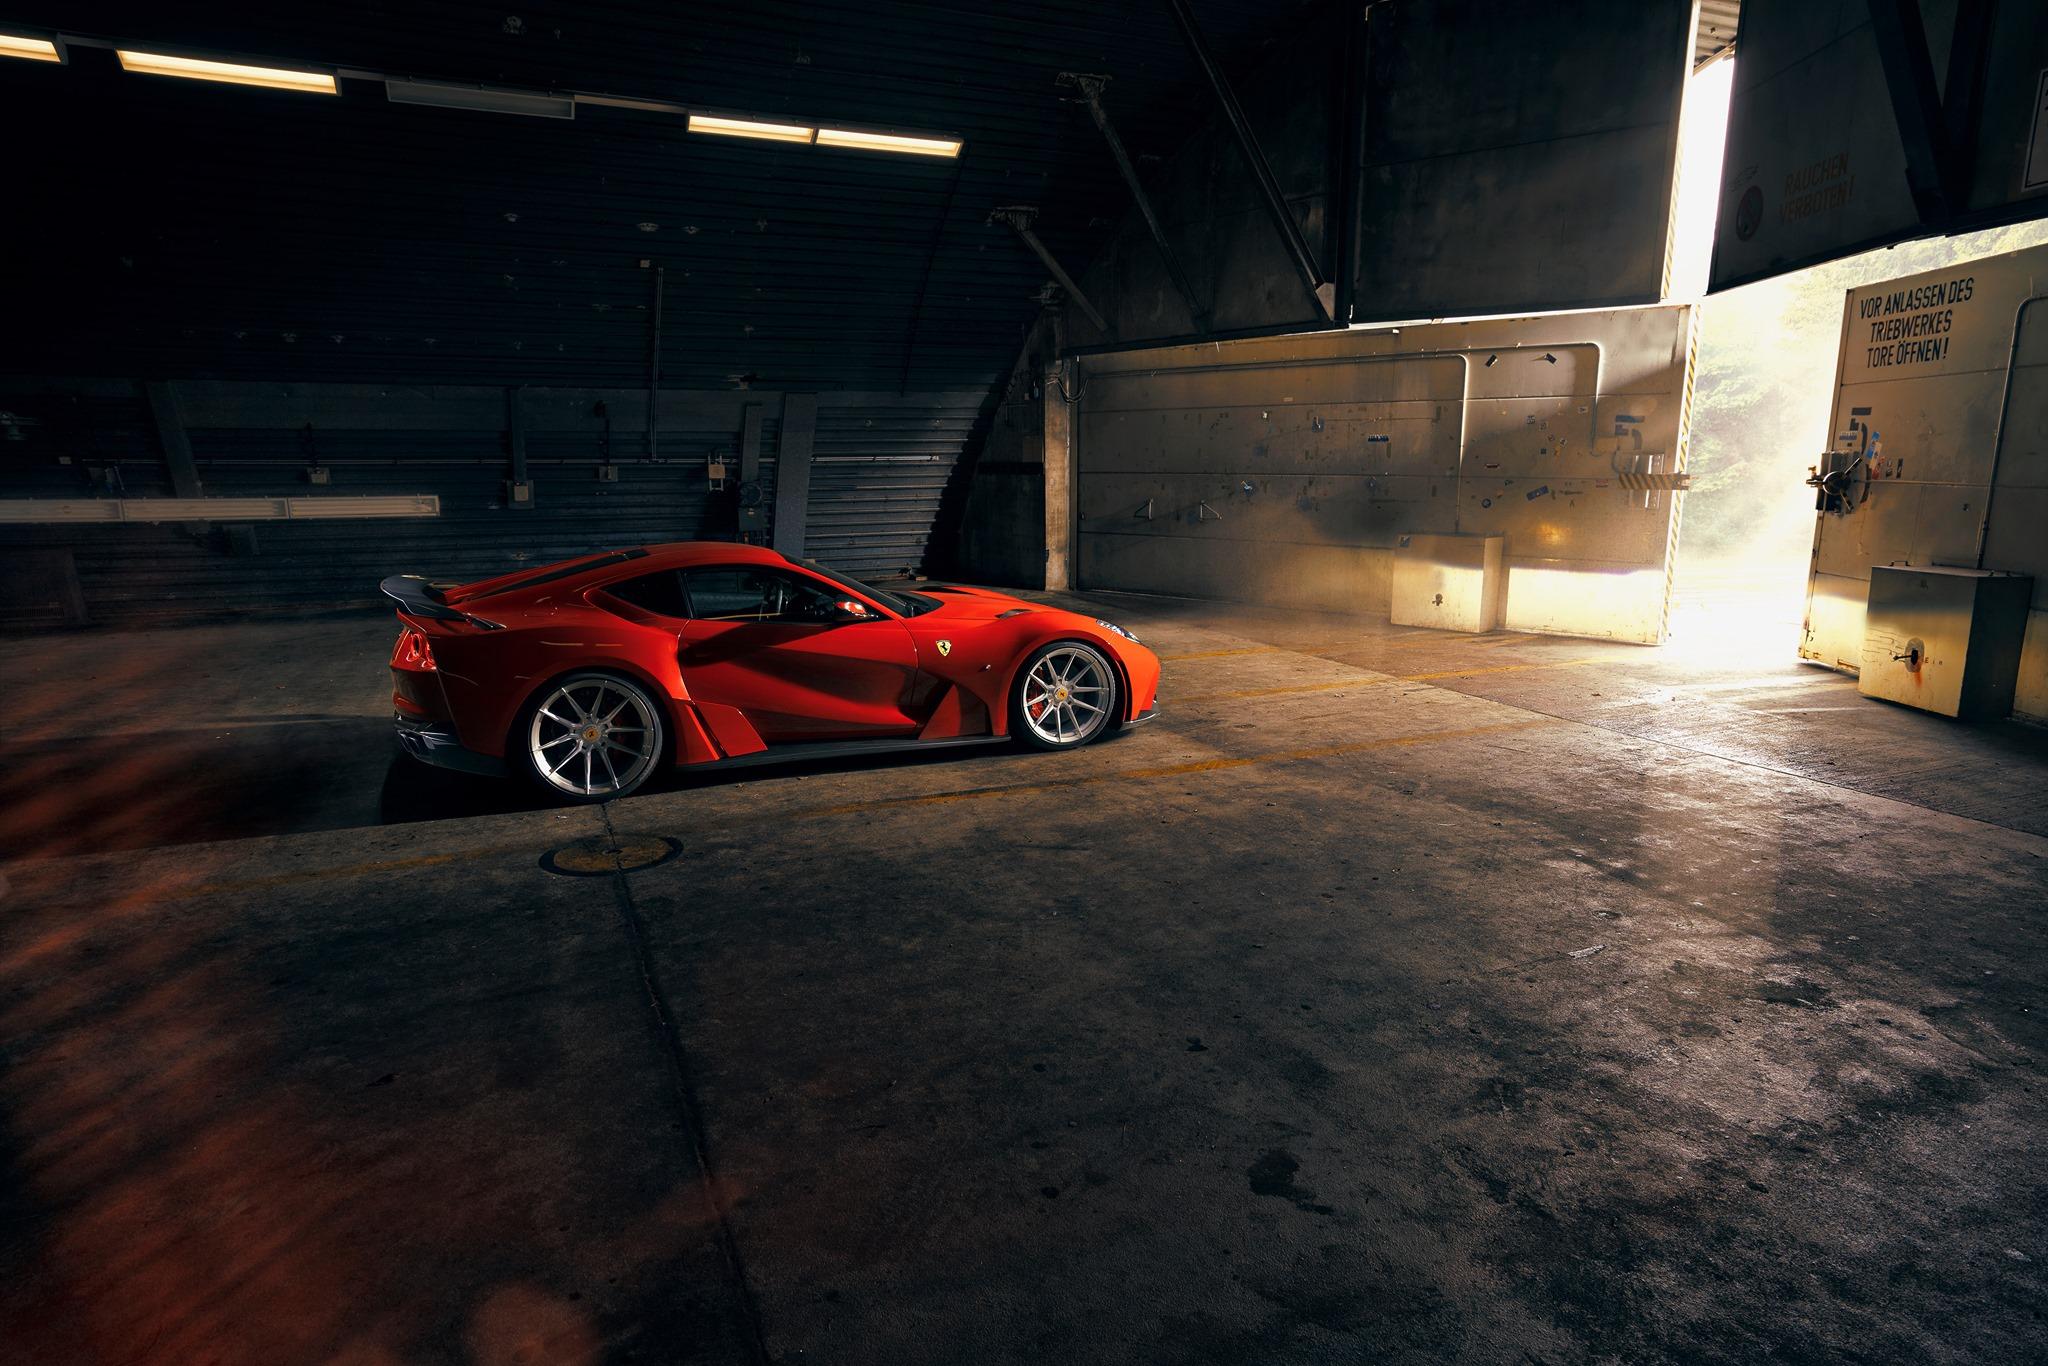 Ferrari-812-Superfast-N-Largo-by-Novitec-9